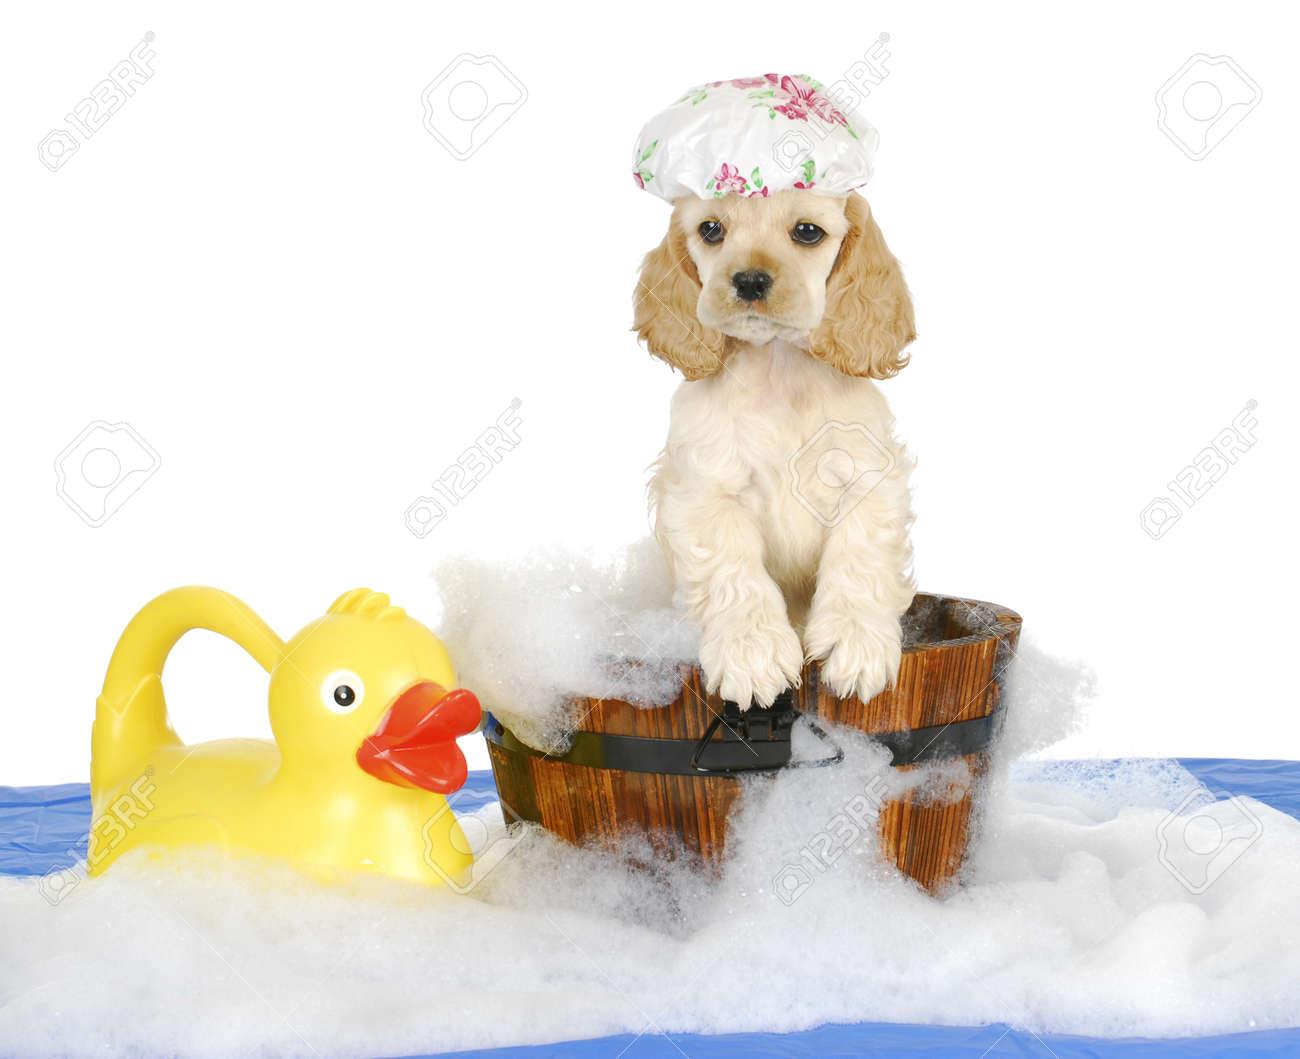 puppy bath time - american cocker spaniel puppy having a bath - 8 weeks old Stock Photo - 14928599